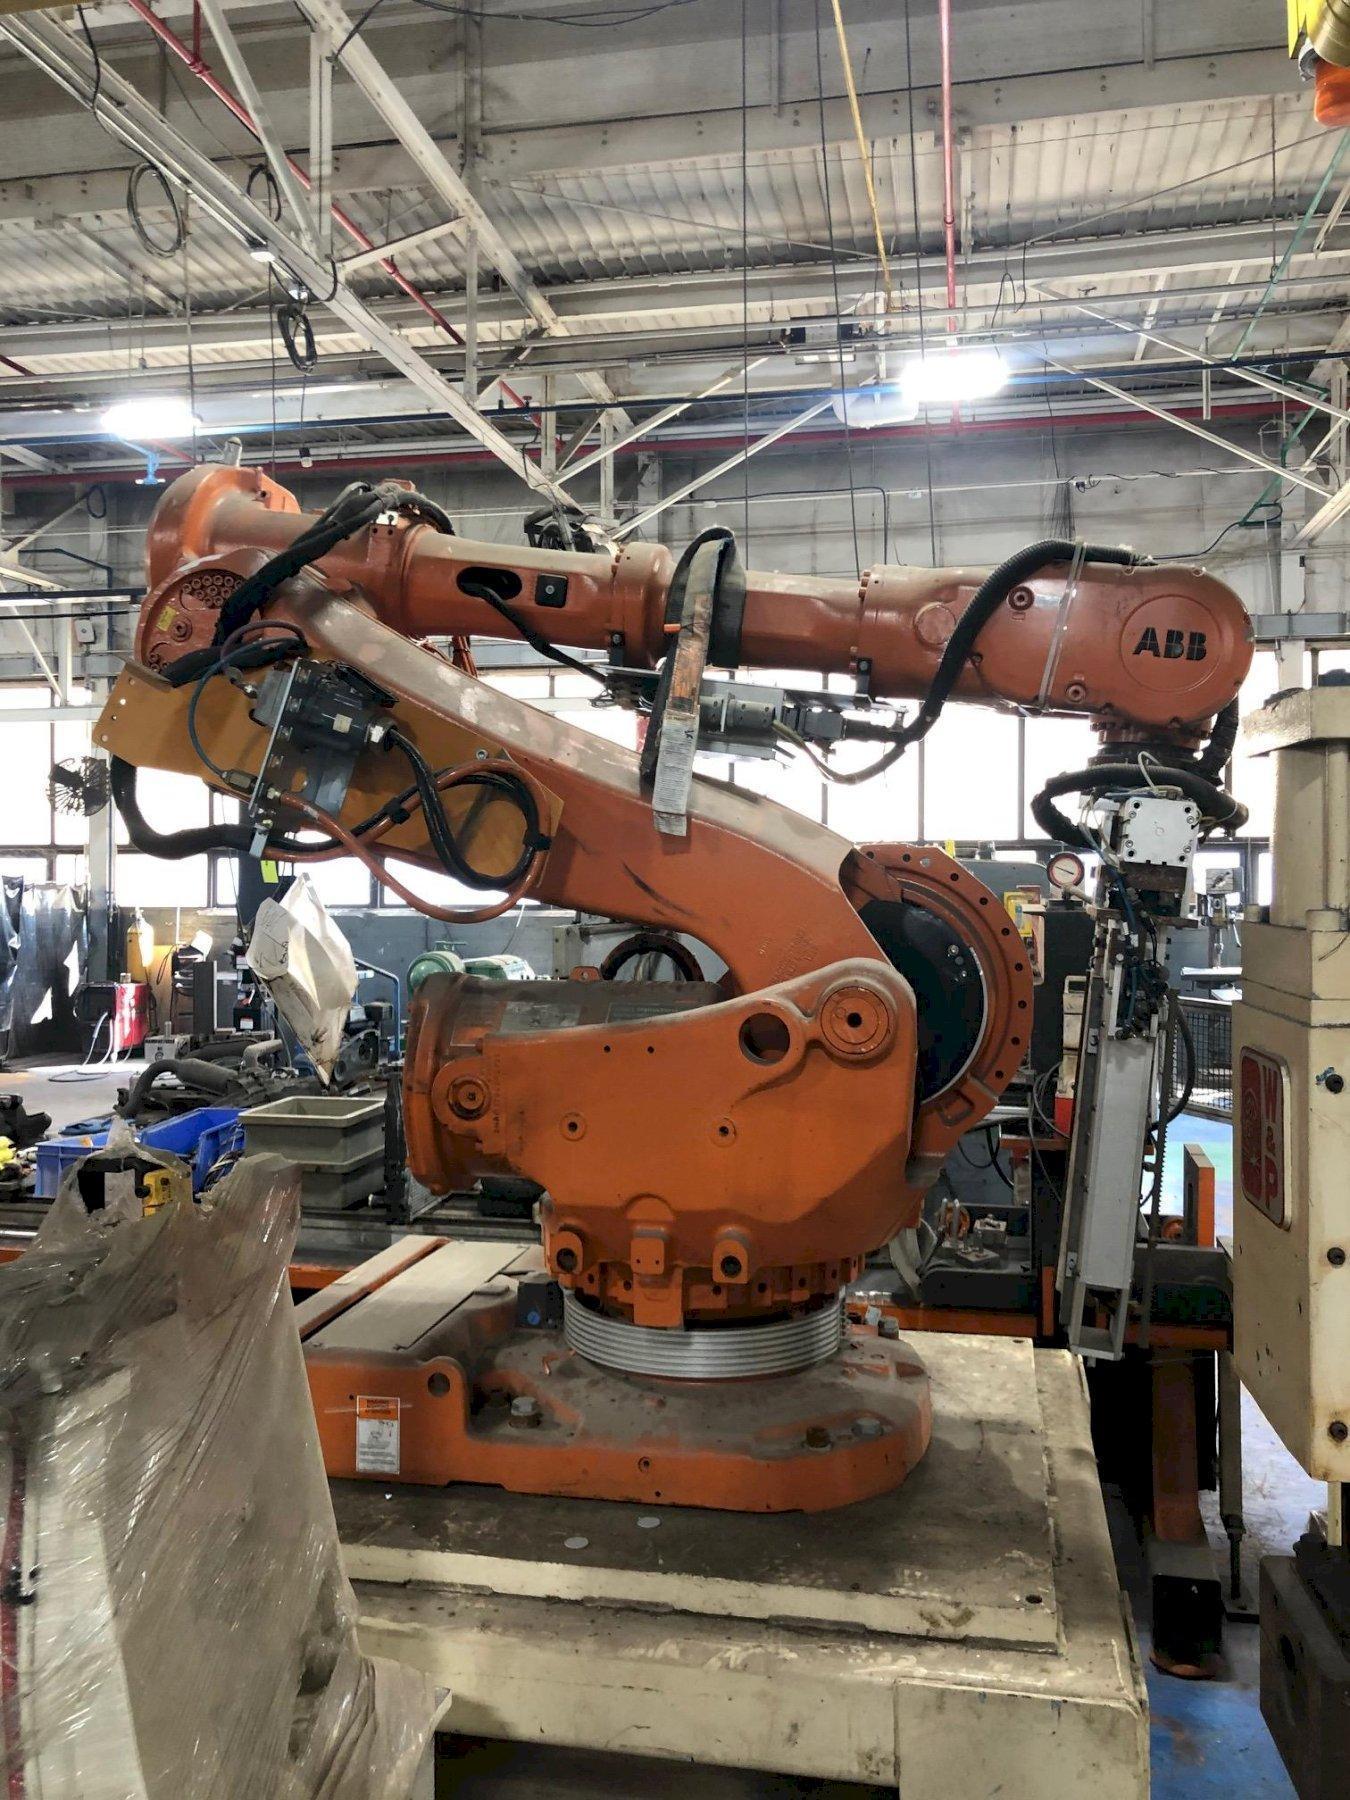 ABB Robot Model No.: IRB 6600 M2004